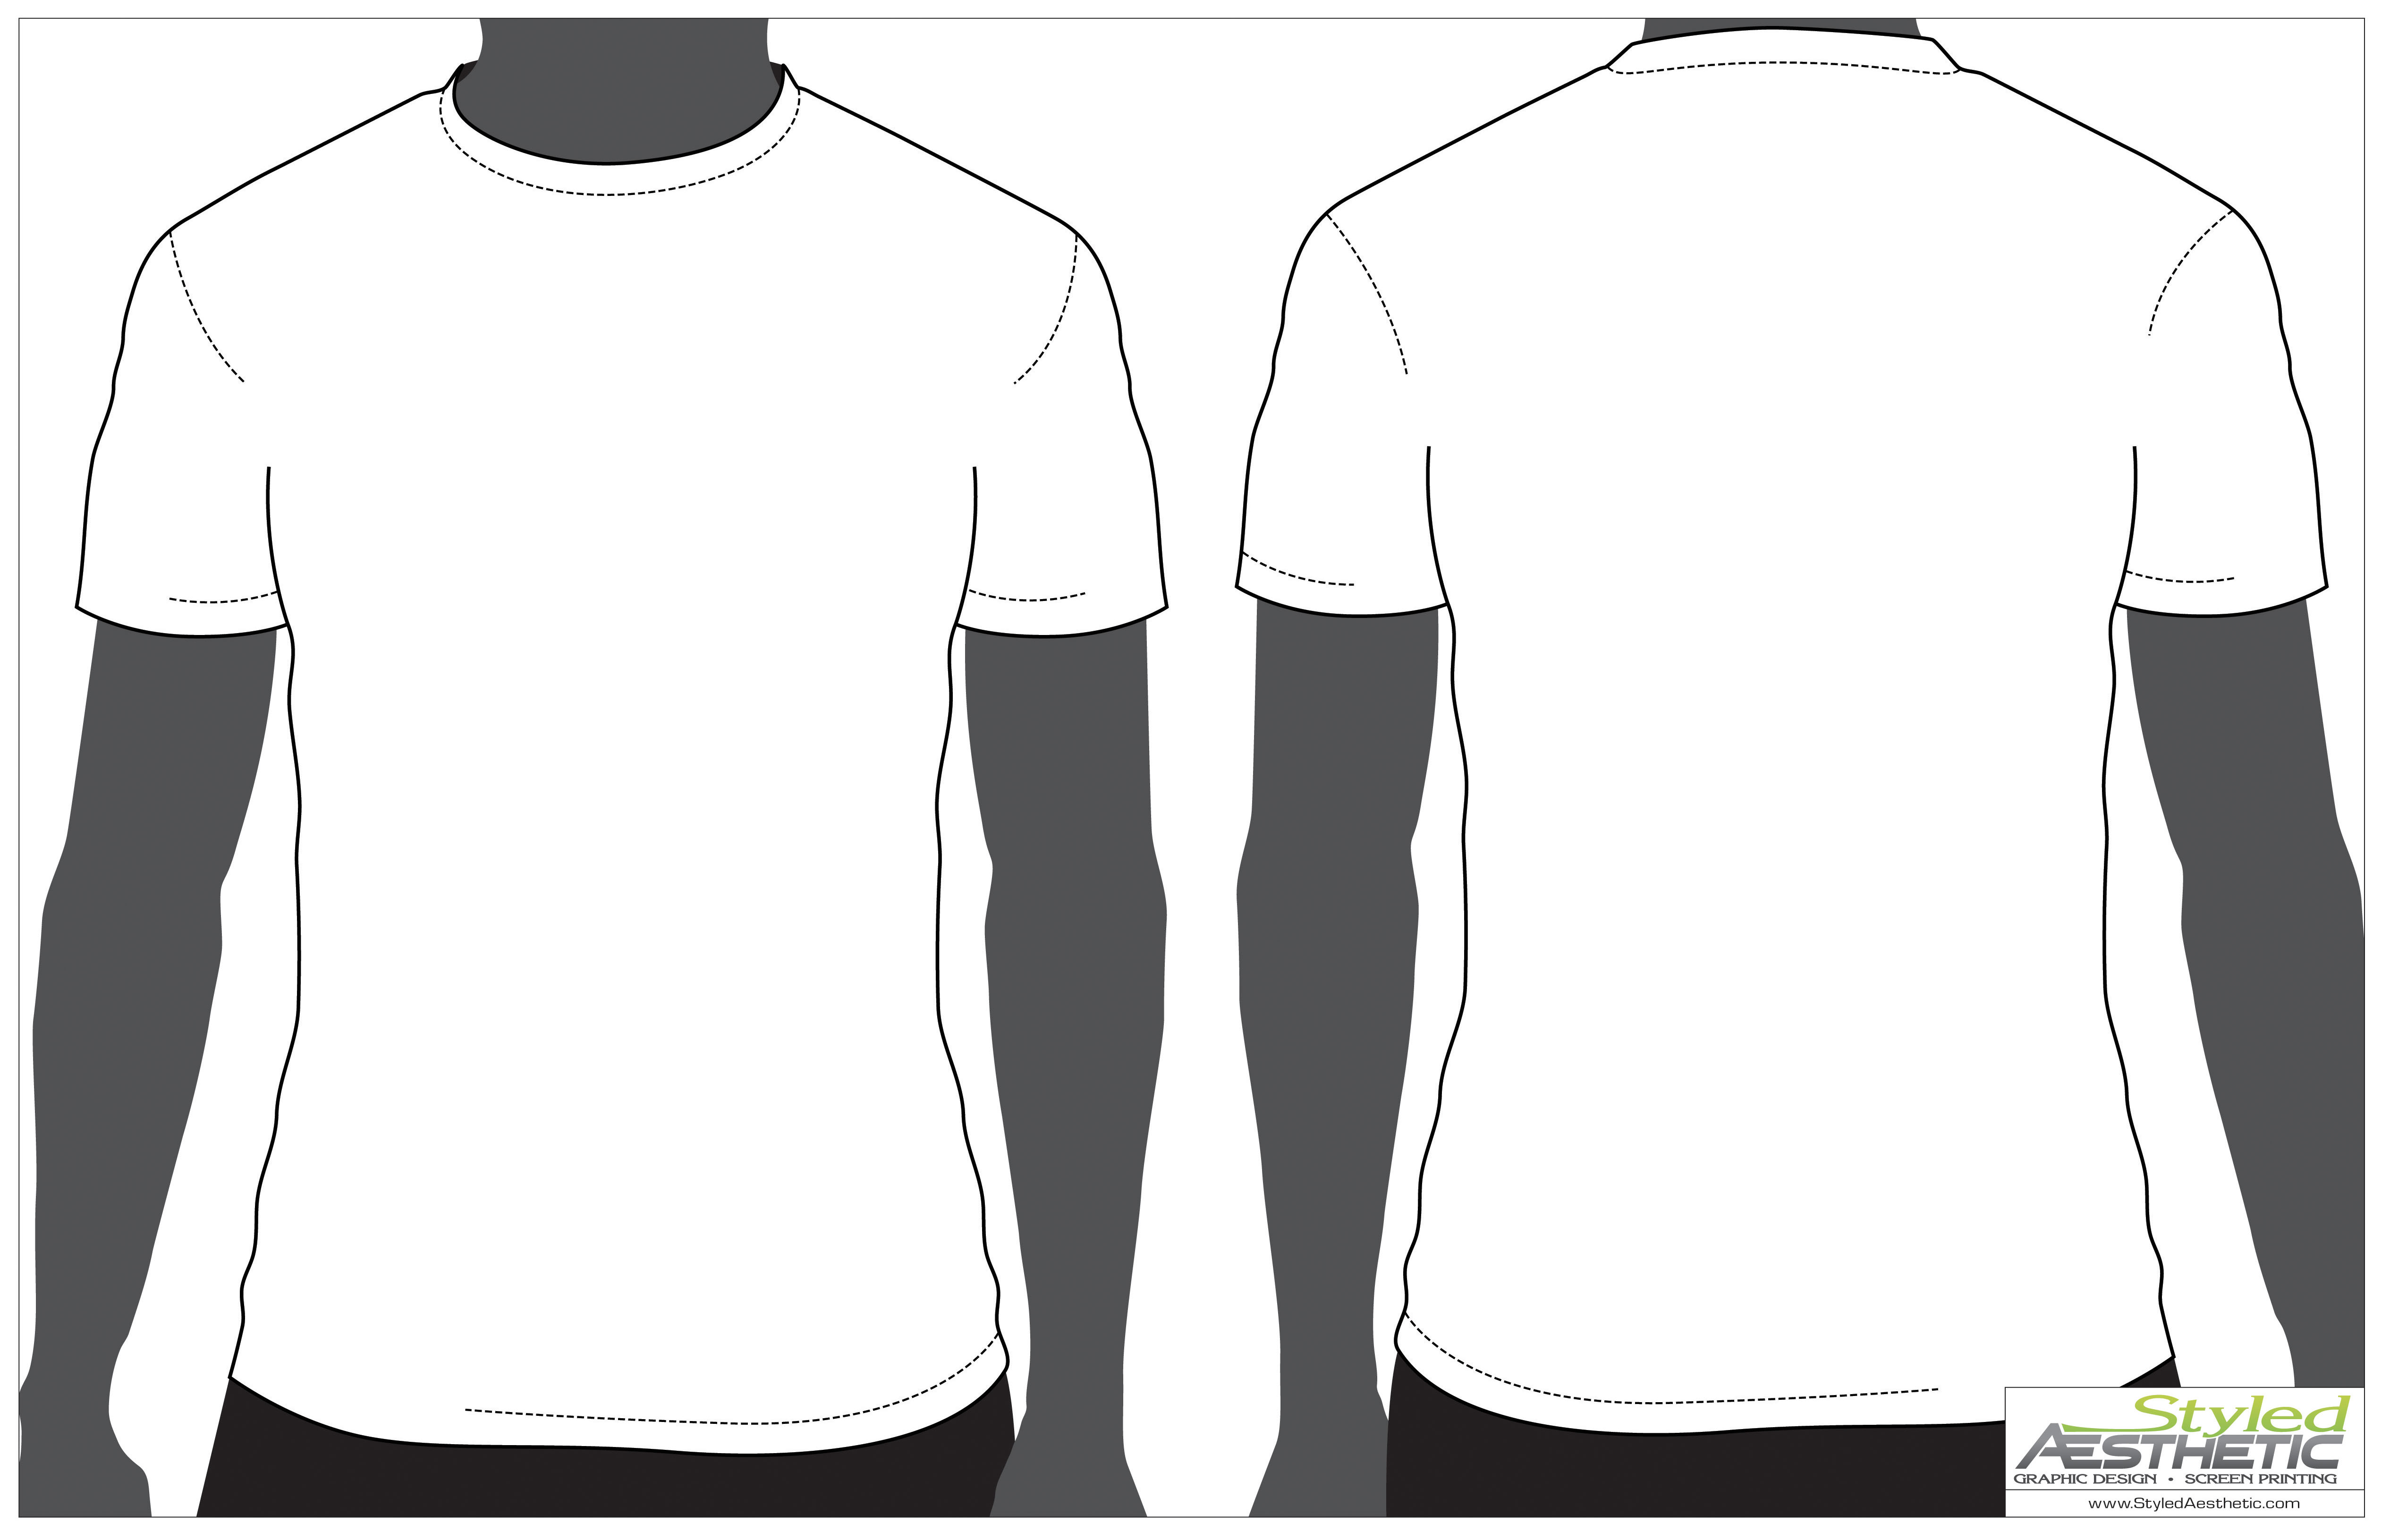 Black t shirt plain front and back - Black T Shirt Back And Front Plain Large T Download